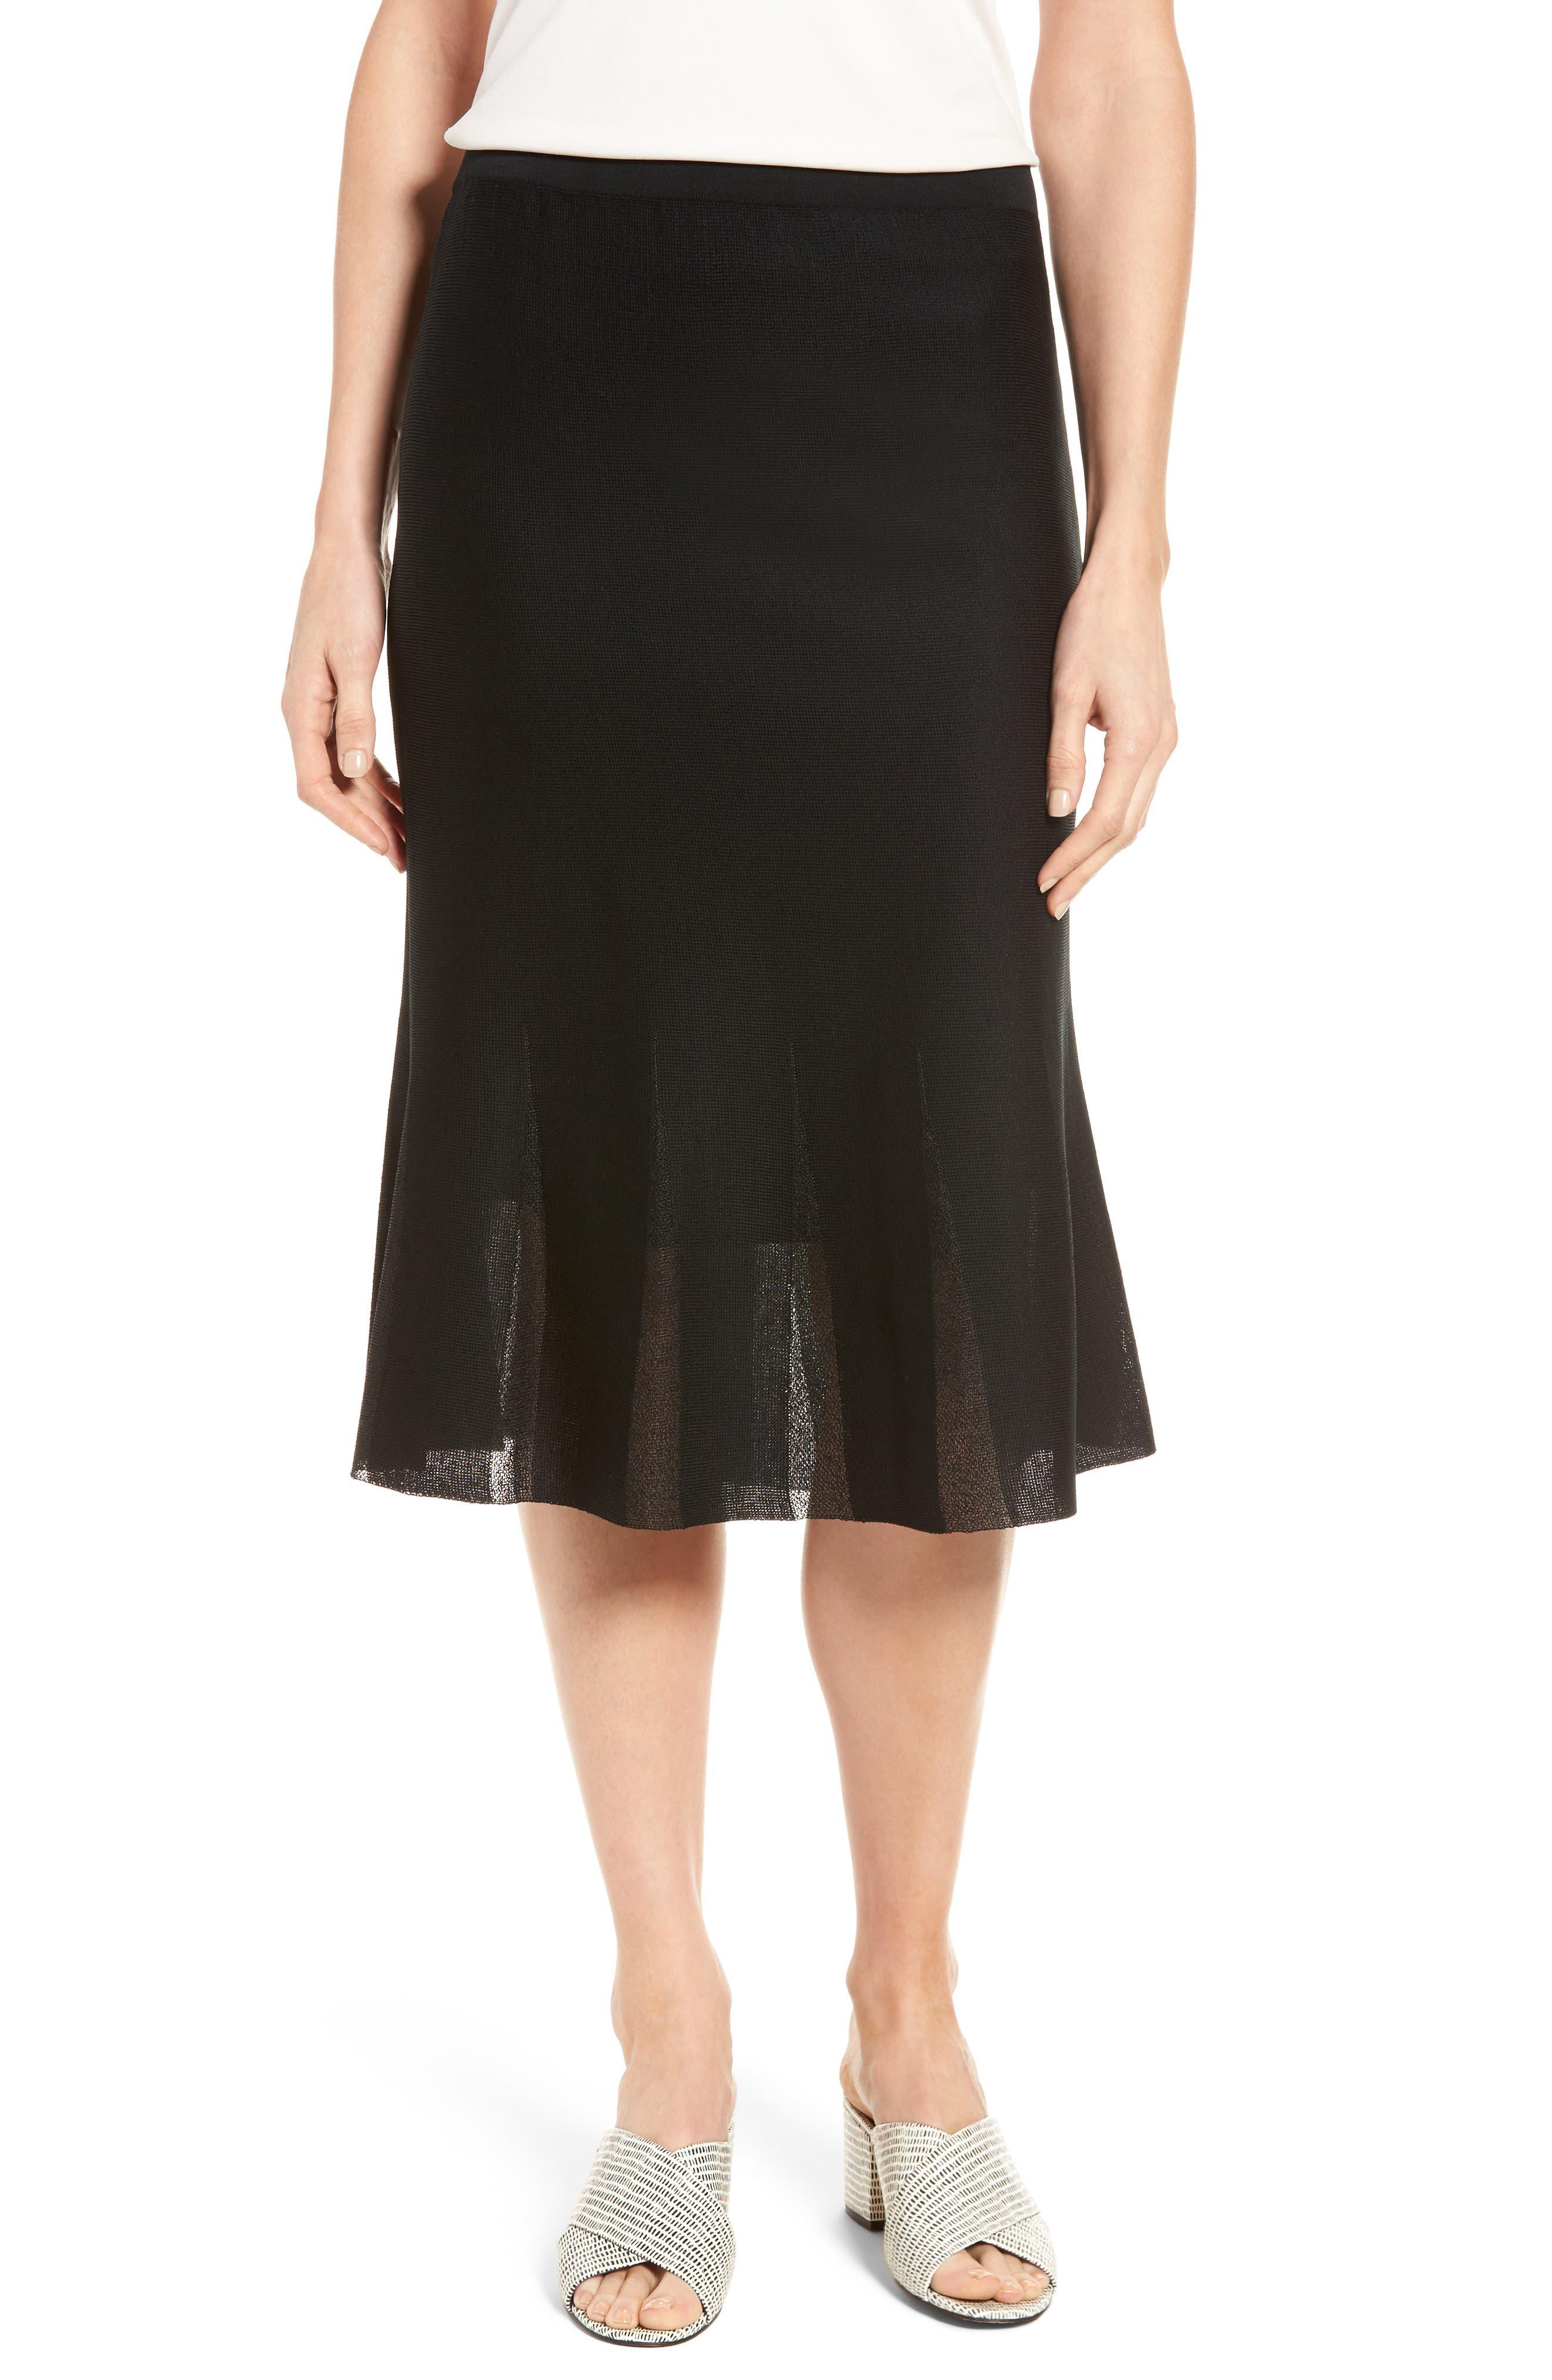 Alternate Image 1 Selected - Ming Wang Knit Flared Skirt